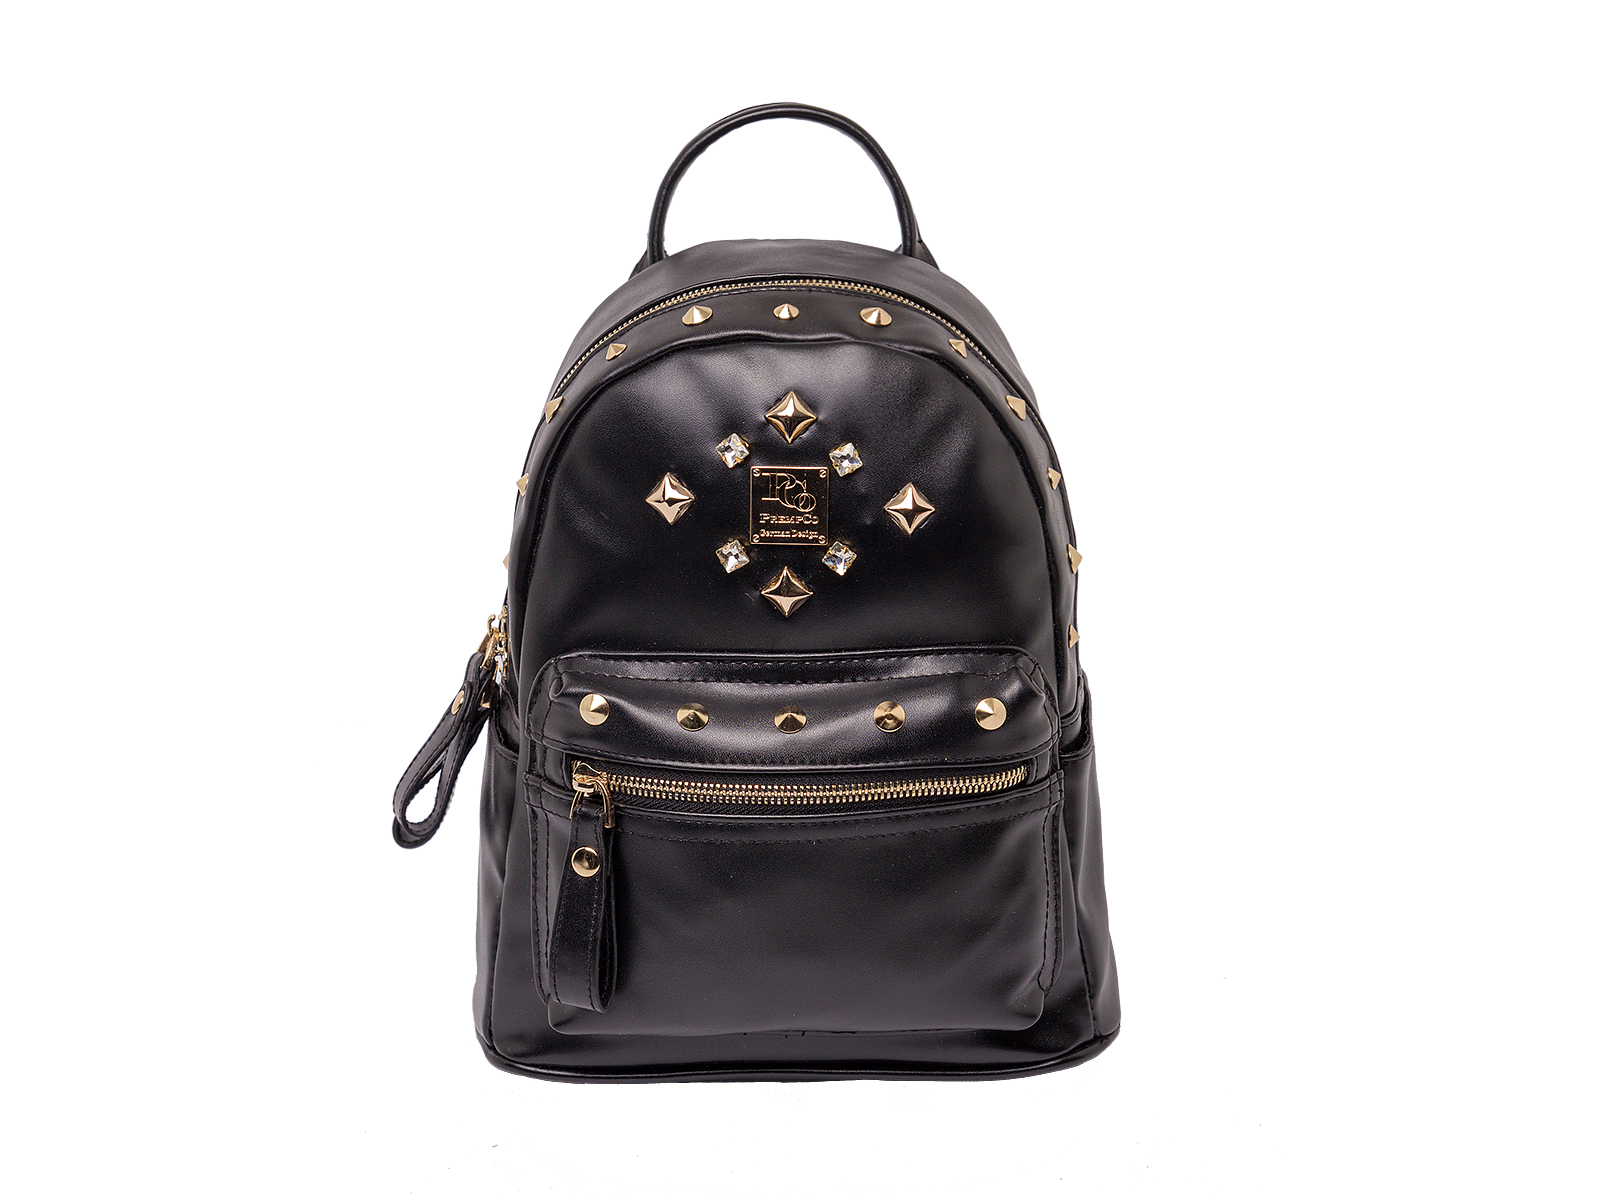 PCo mini damen rucksack schwarz Designer Rucksack Luxus